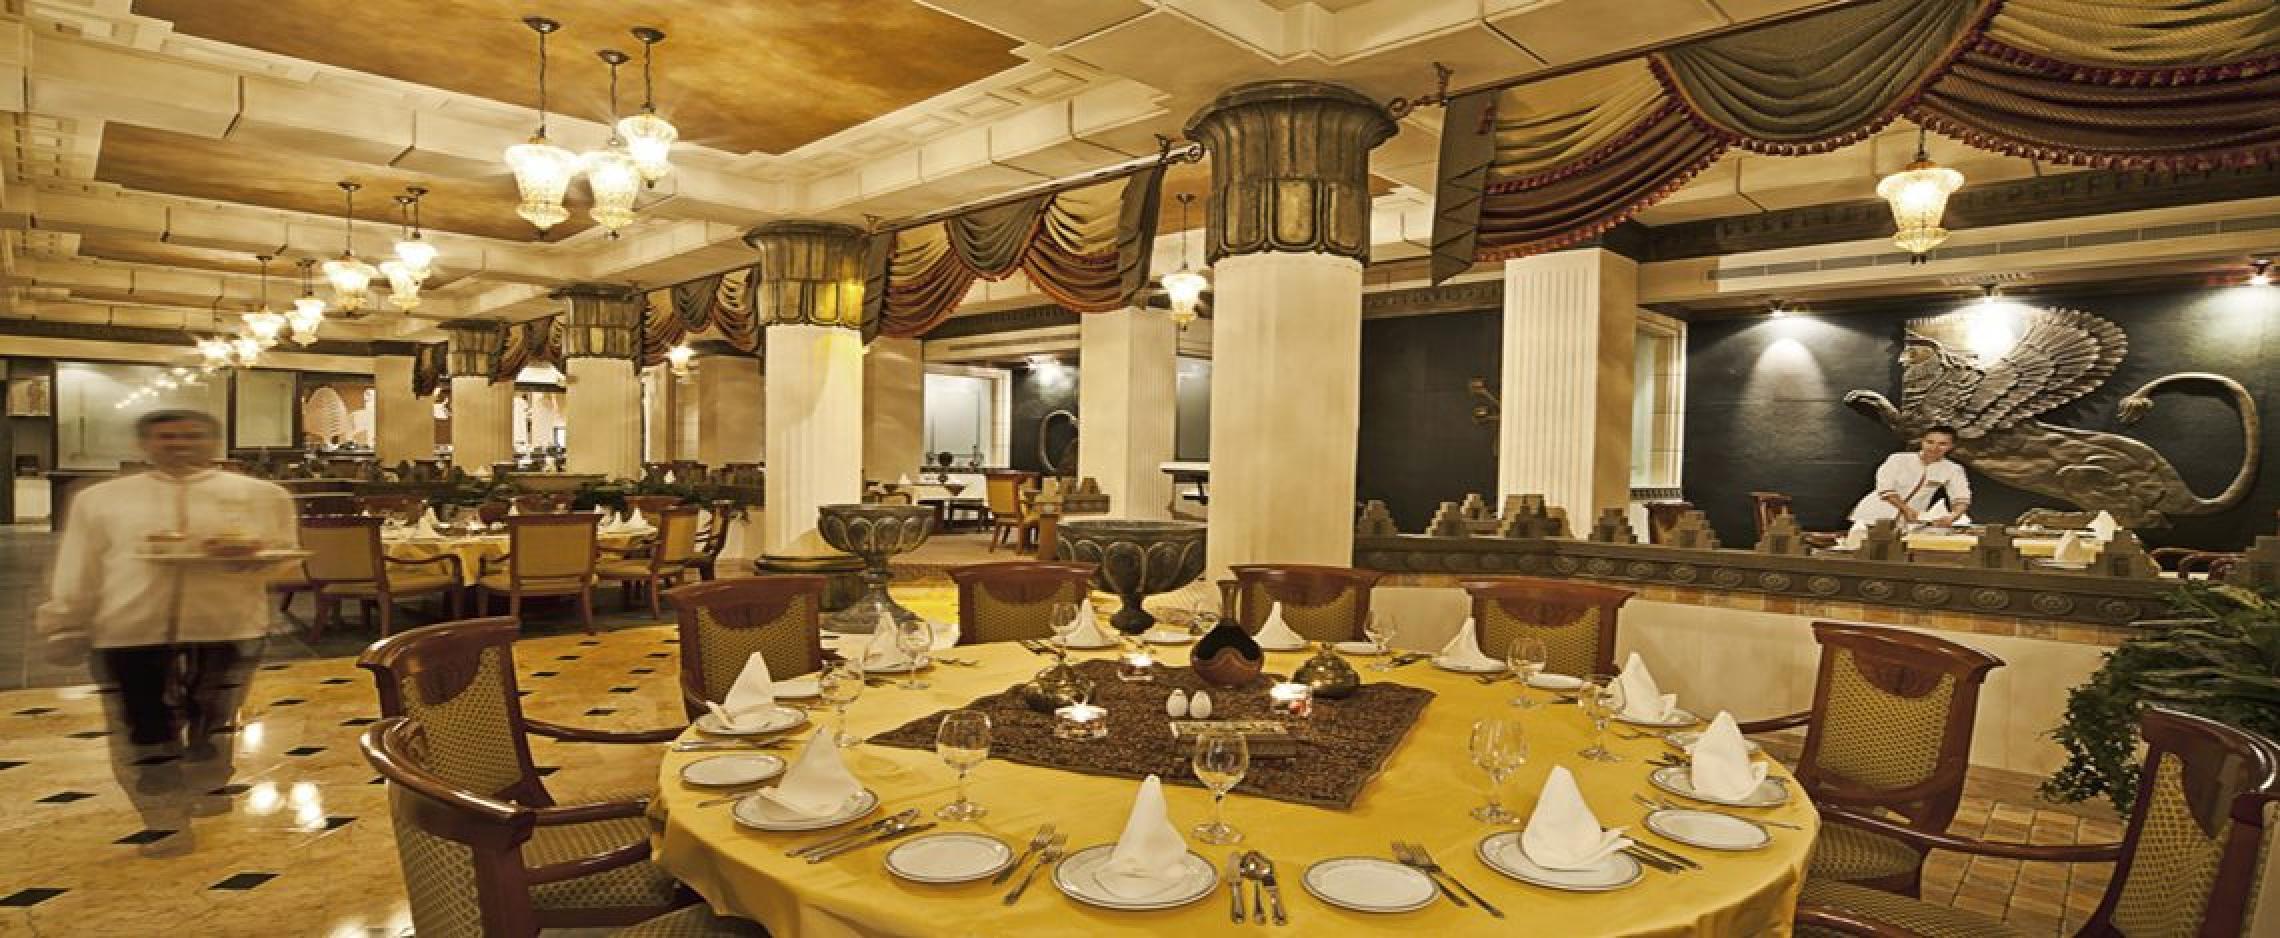 Takht Jamsheed Luxury 5 Star Accomodation In Bahrain